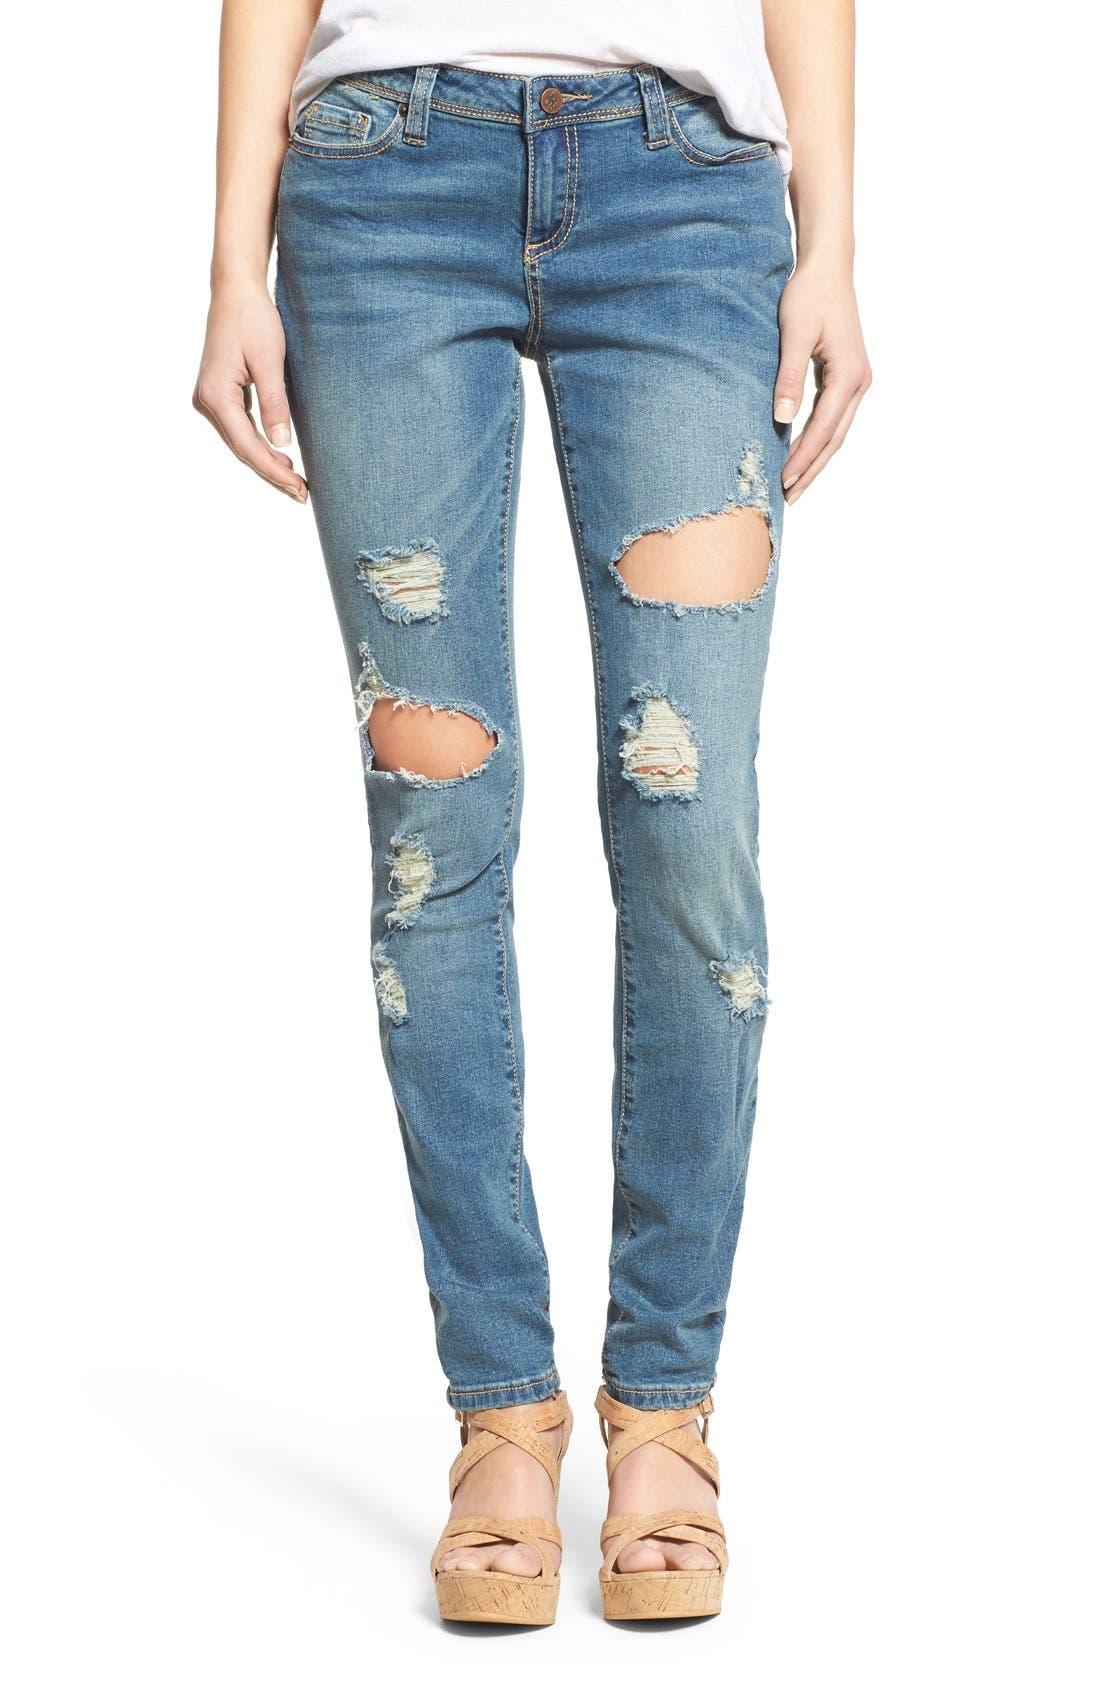 Alternate Image 1 Selected - Poetic Justice 'Maya' Distressed Mid Rise Skinny Jeans (Tough Love)